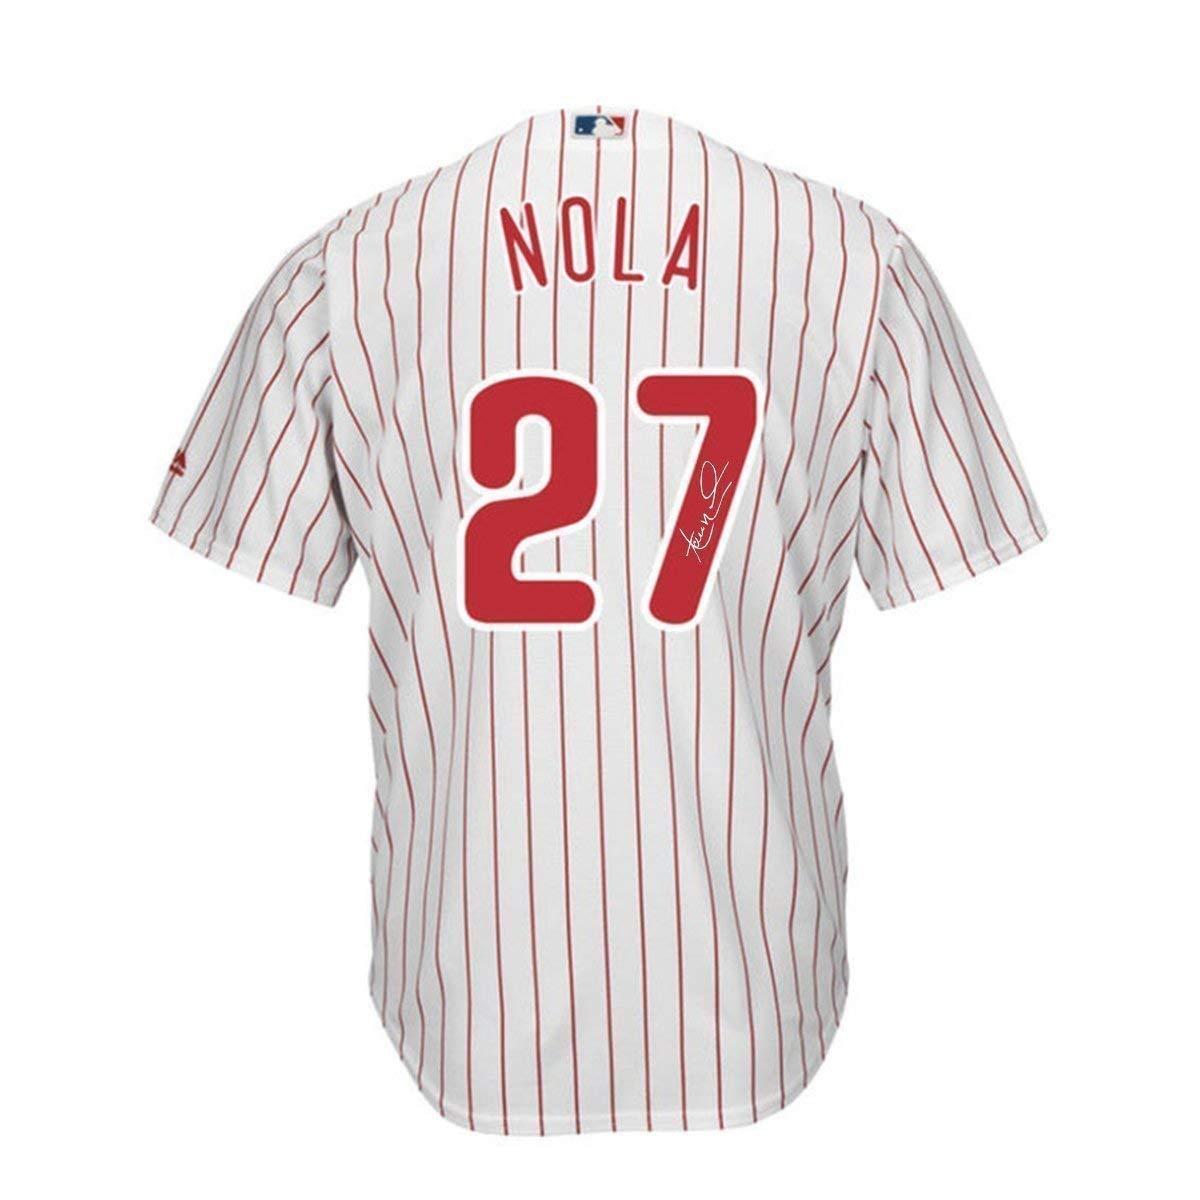 super popular f3551 4520e Aaron Nola Signed Philadelphia Phillies Home Replica Cool ...